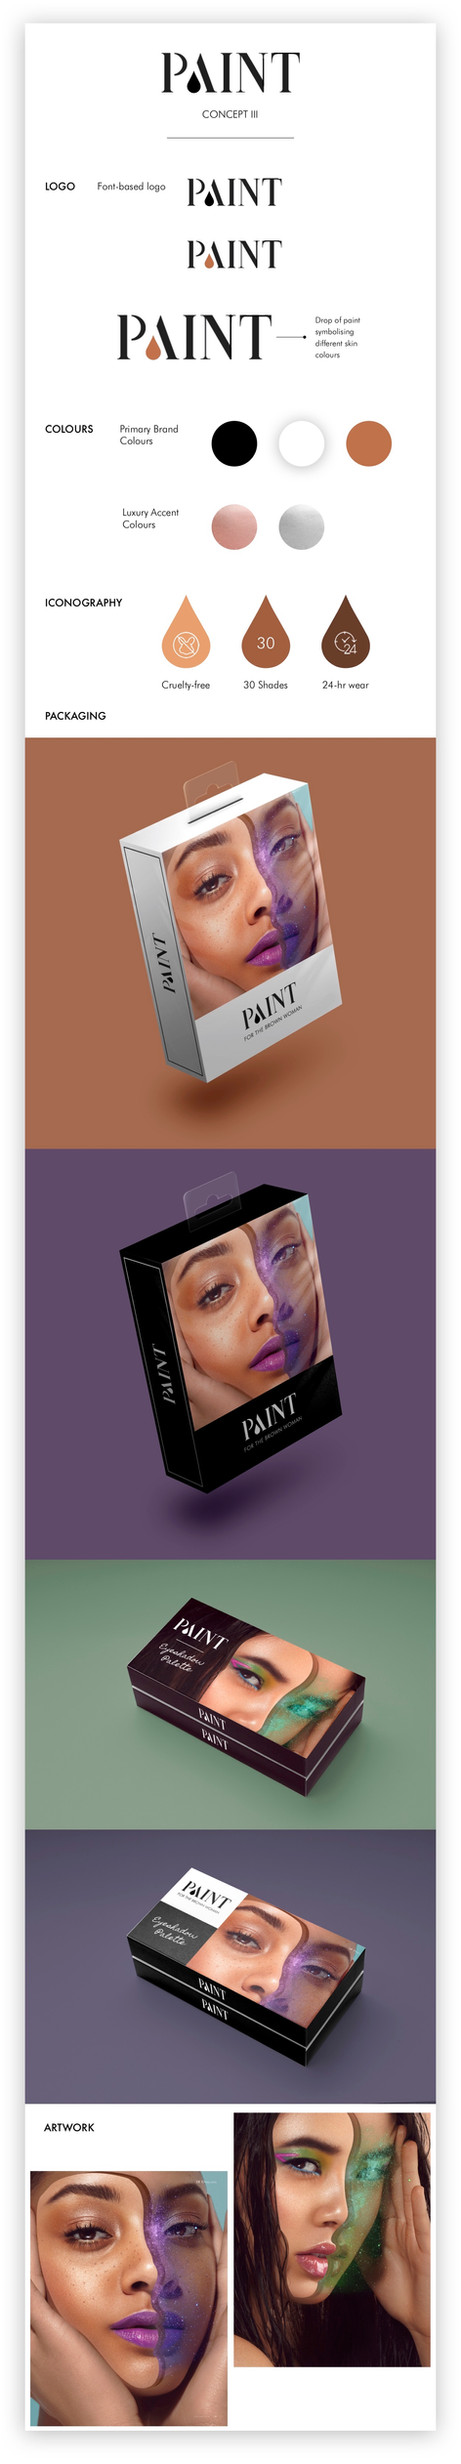 Brand Identity | Paint Cosmetics